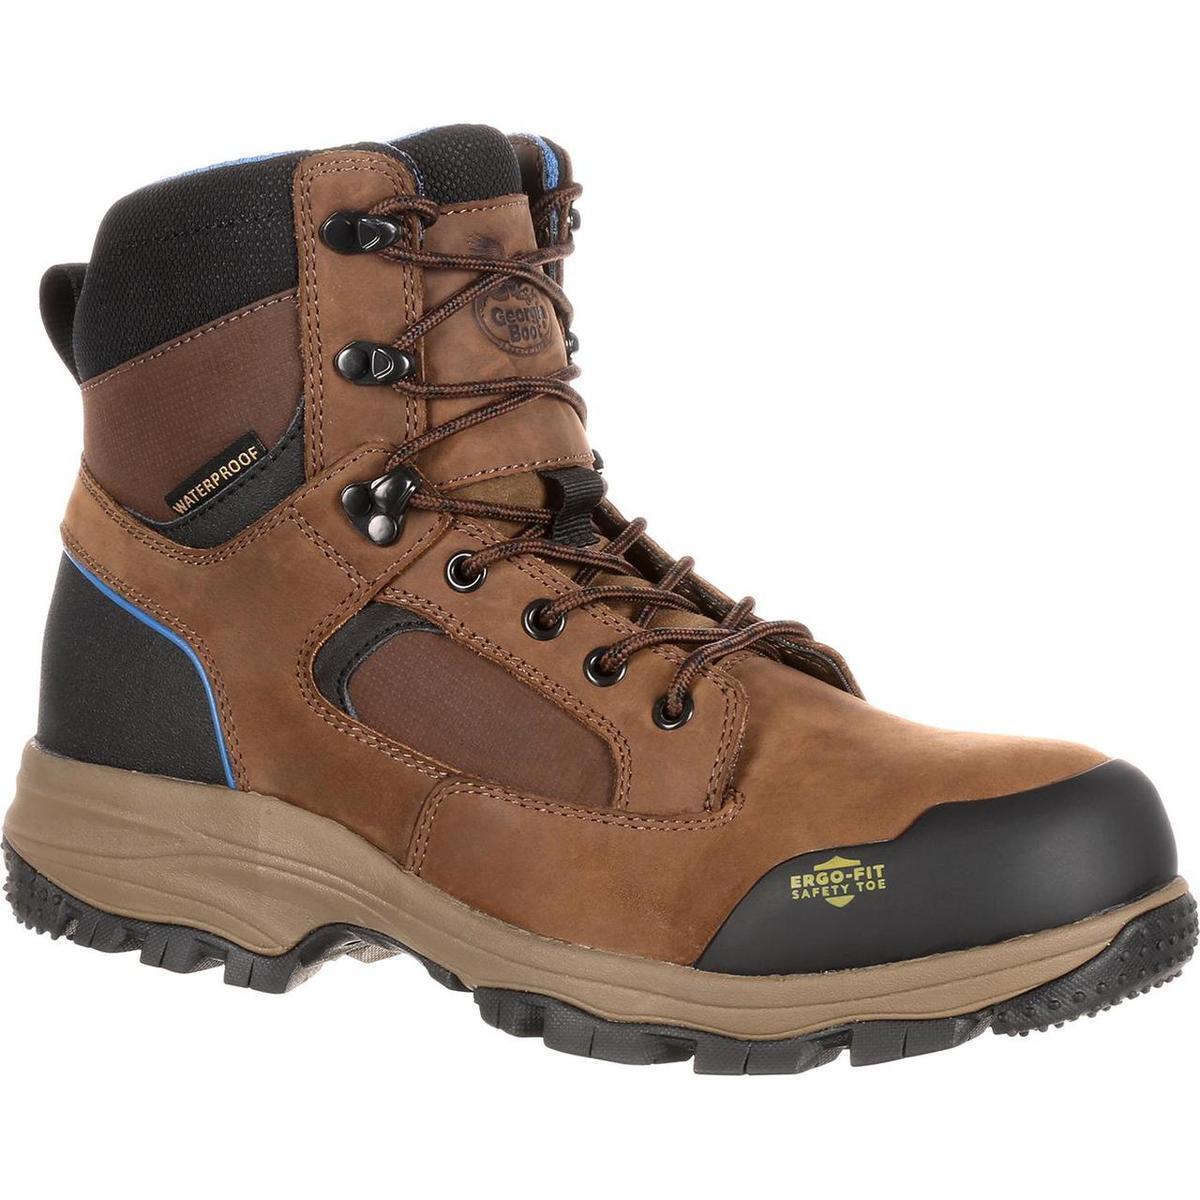 Georgia botas GB00107 azul Collar Impermeable Trabajo excursionista botas Marrón Oscuro